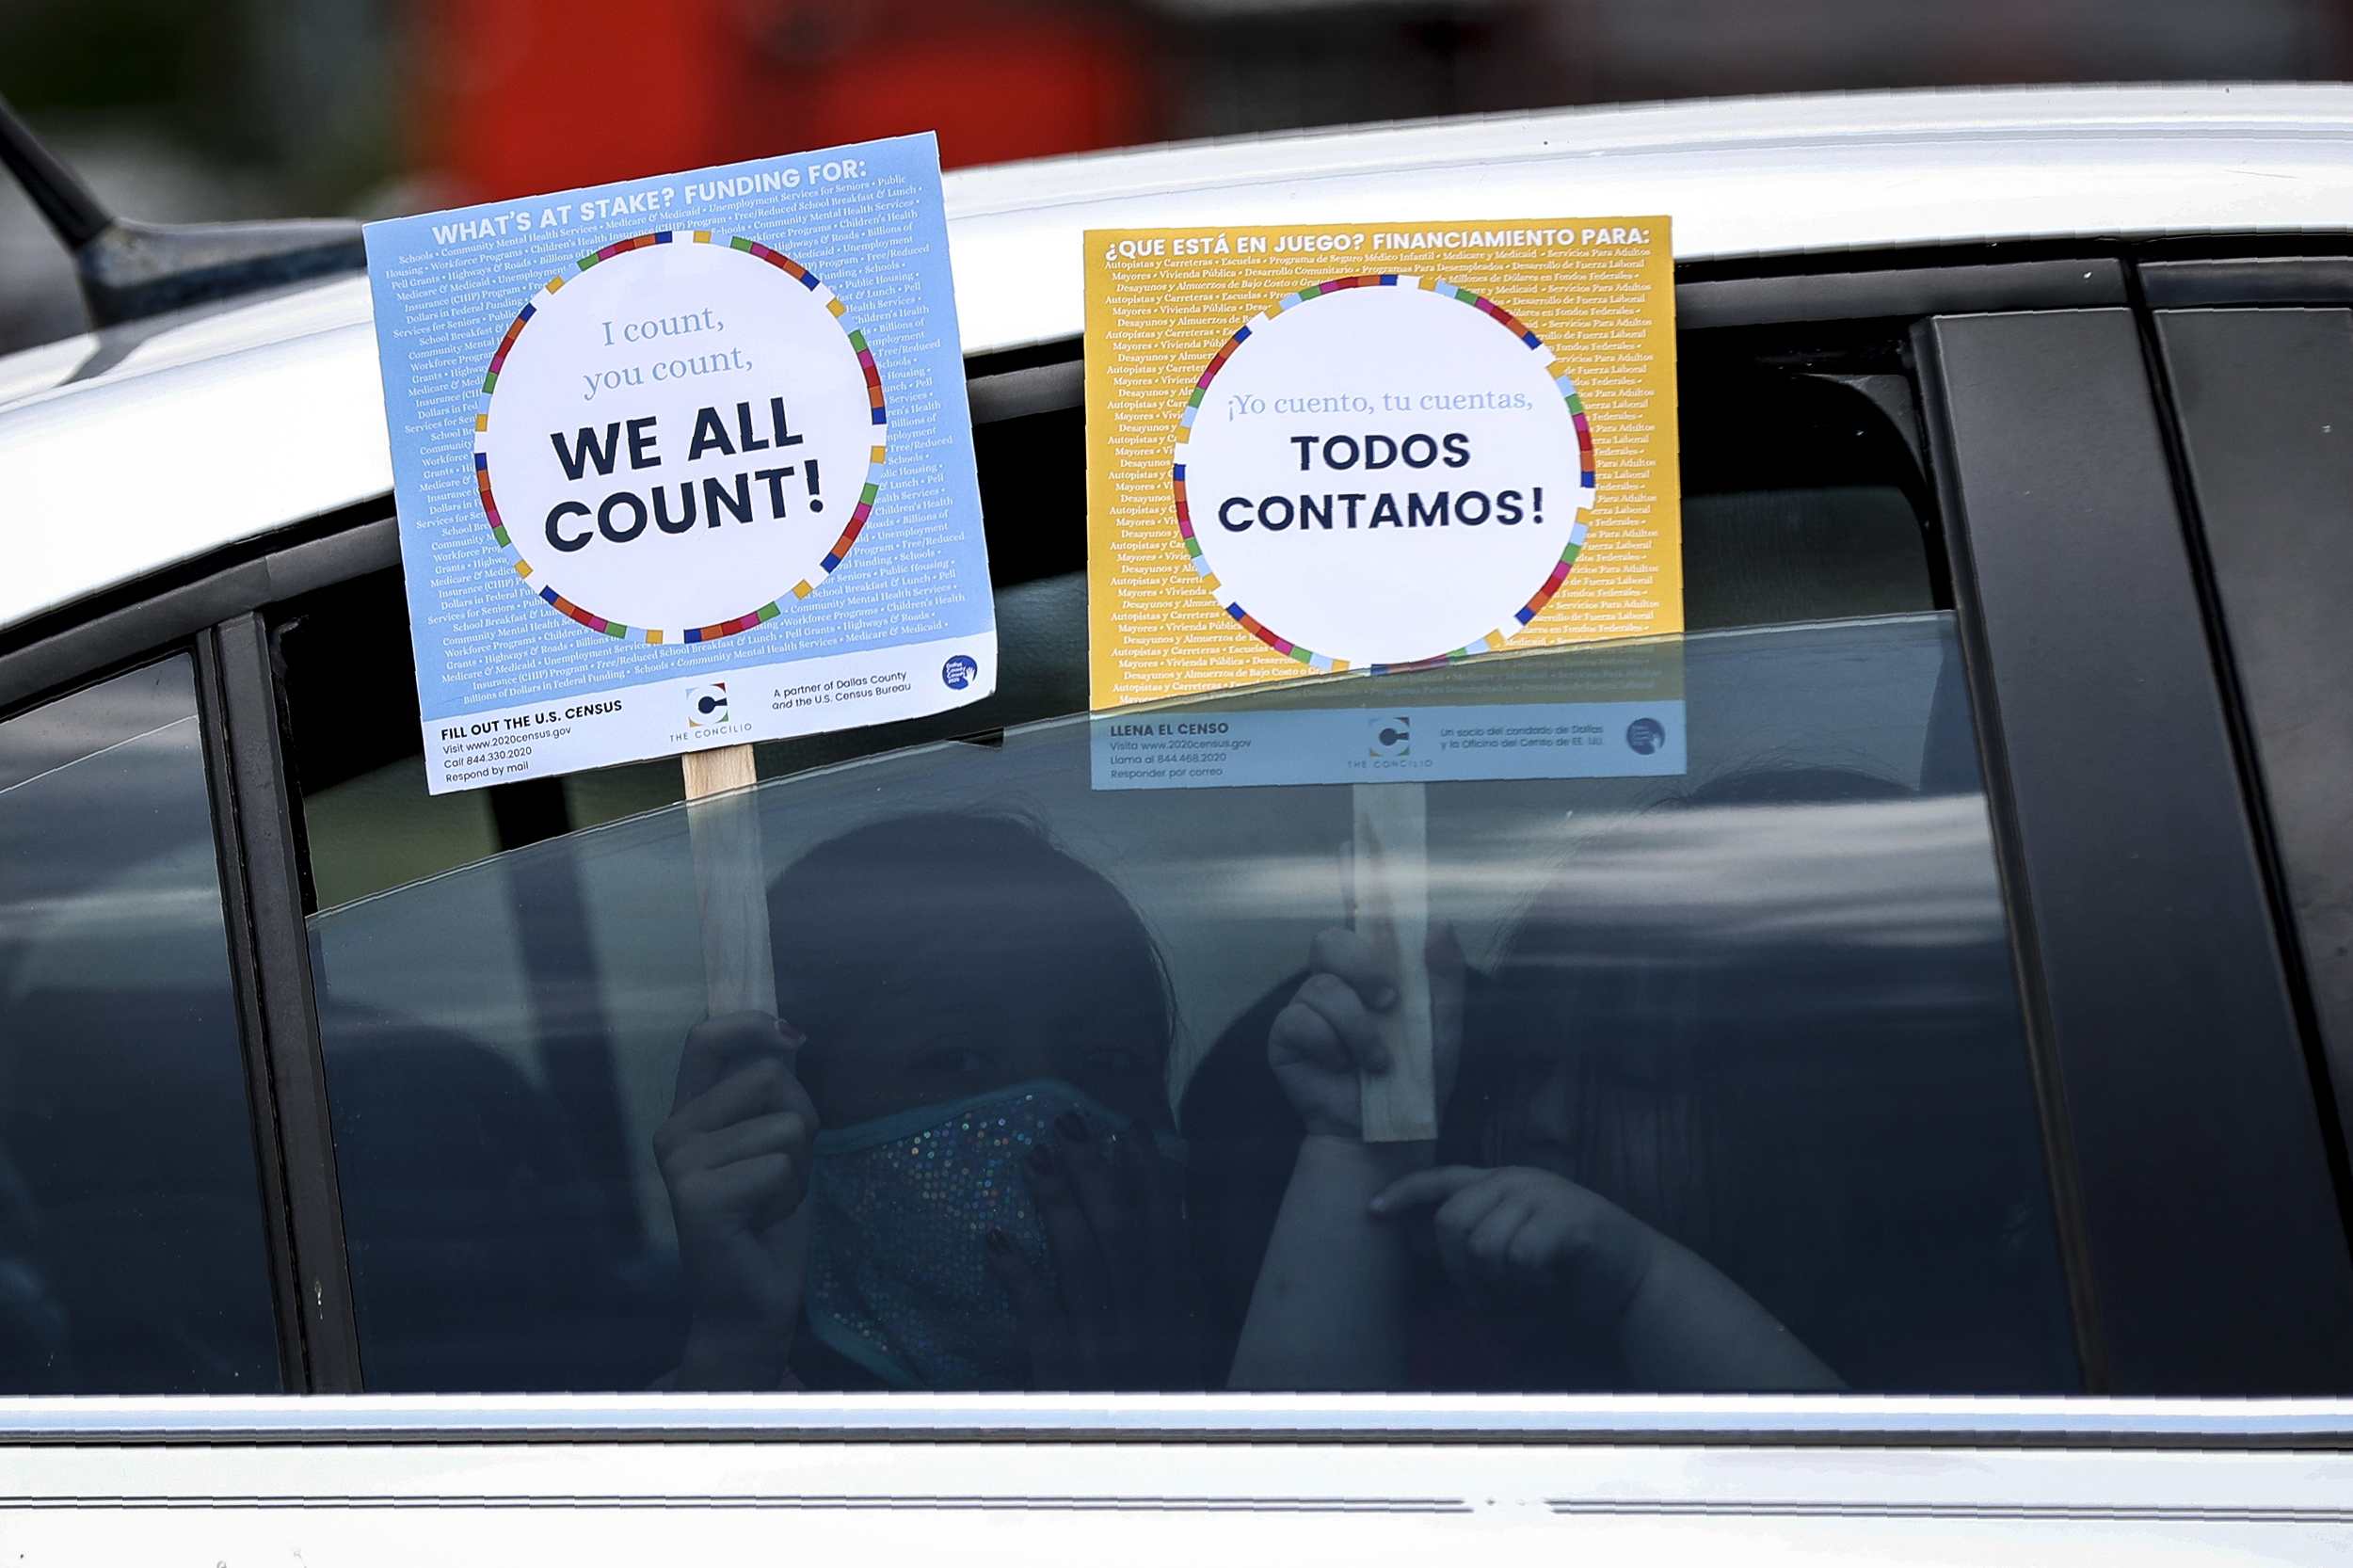 Latinos' next census task: Get money and power through redistricting